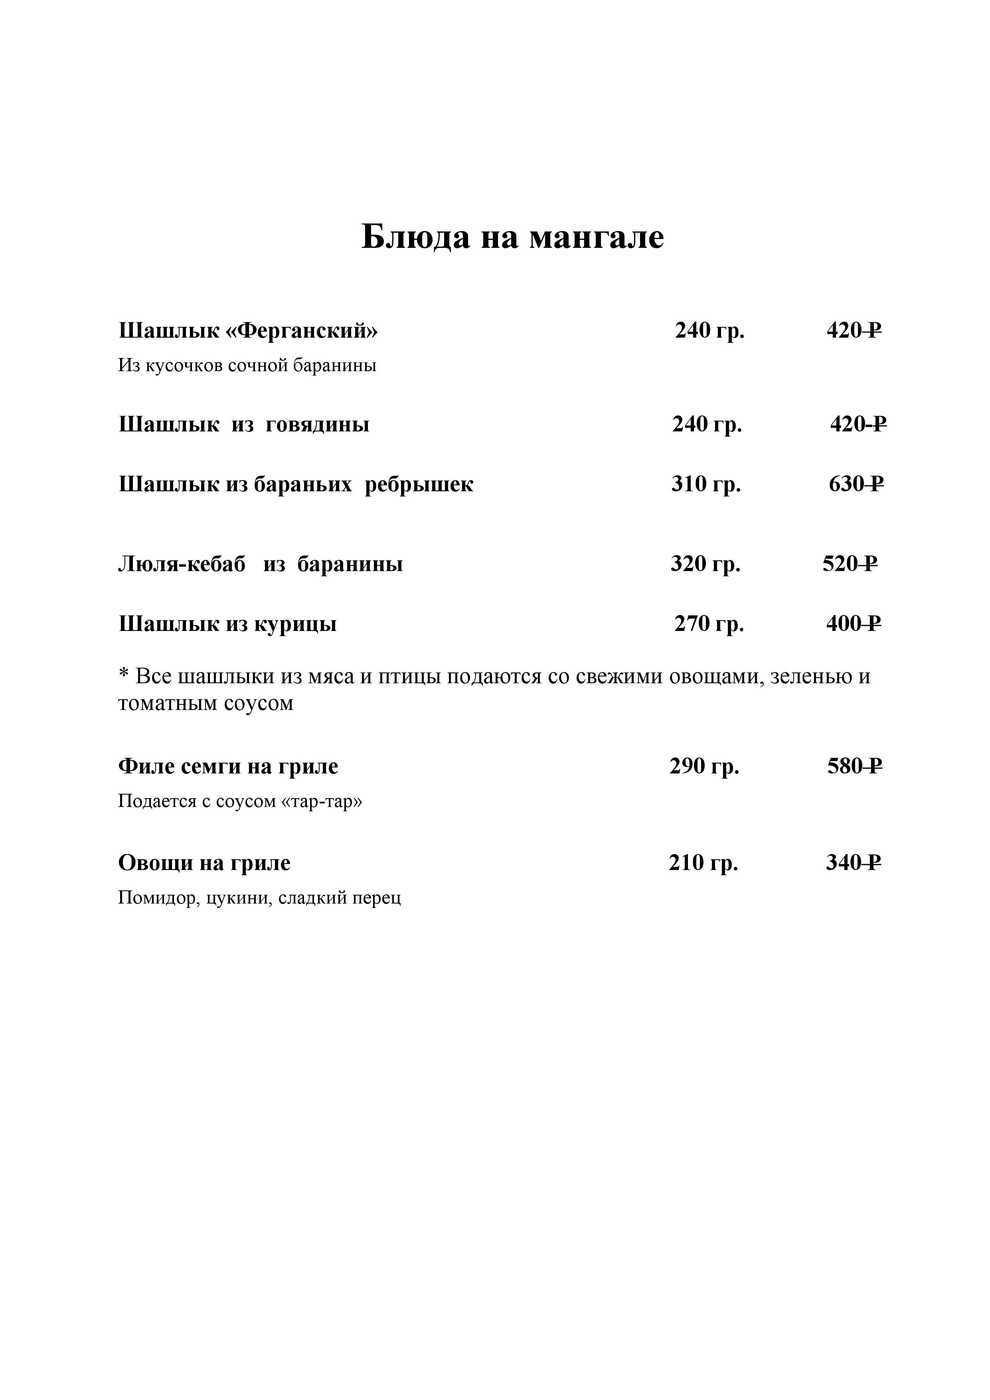 Меню ресторана Навруз на Ленинском проспекте фото 9